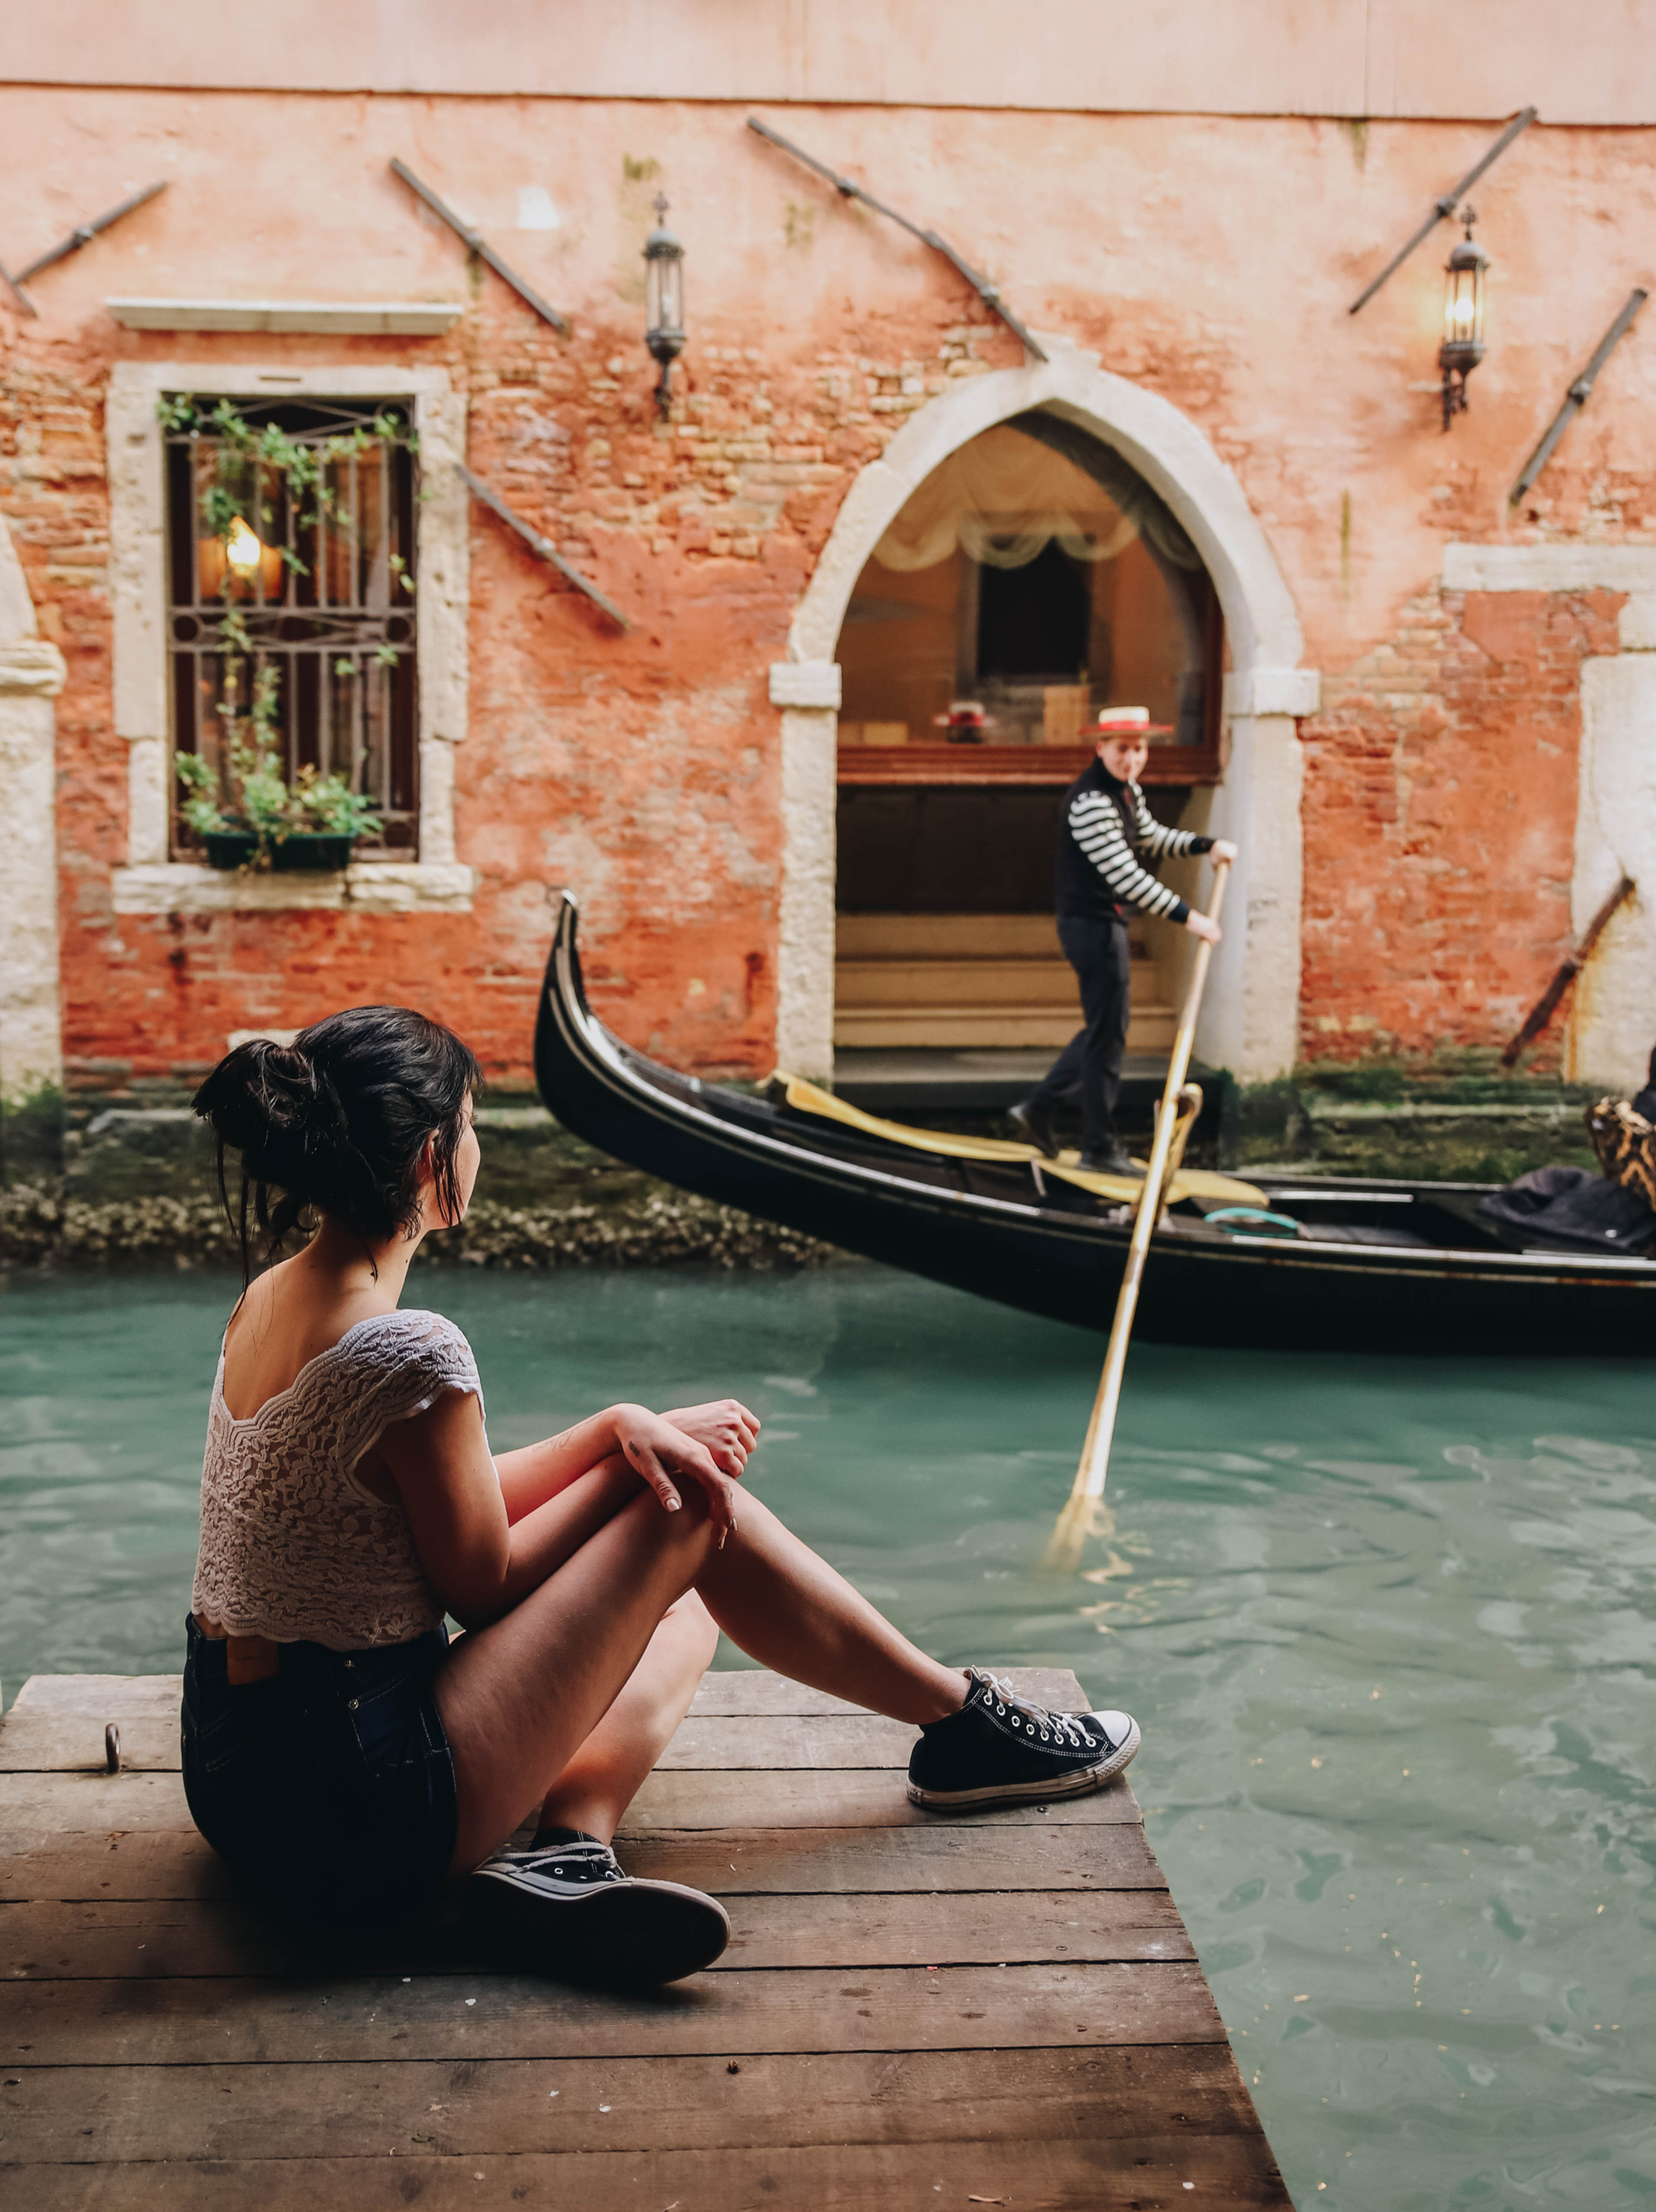 Venice Love story photography walk